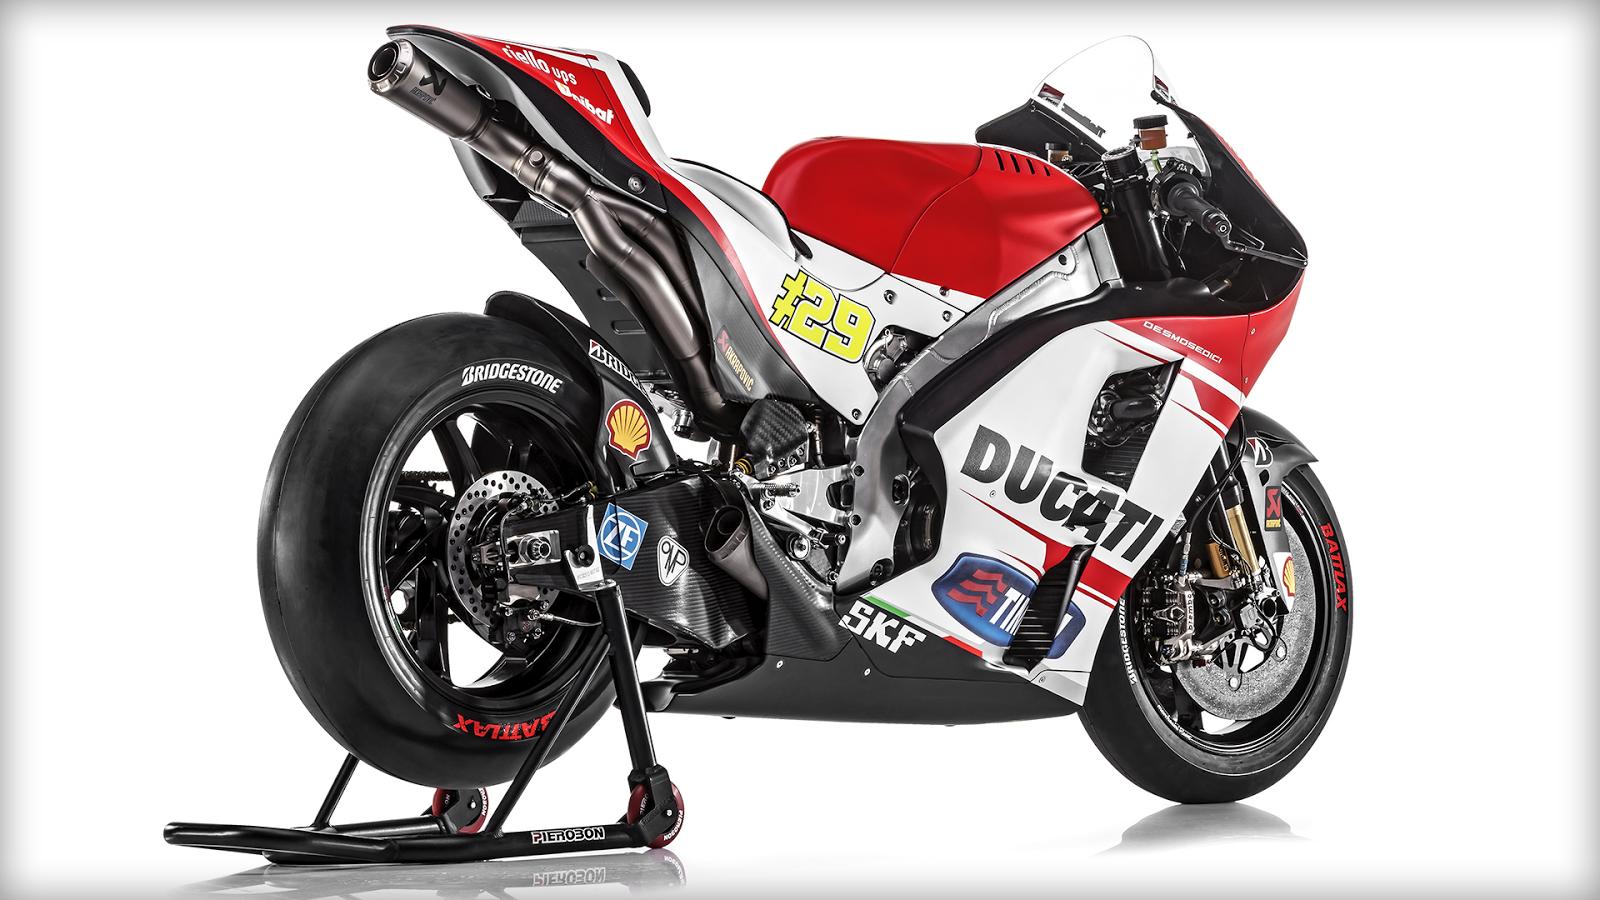 Ducati Motogp Official Website